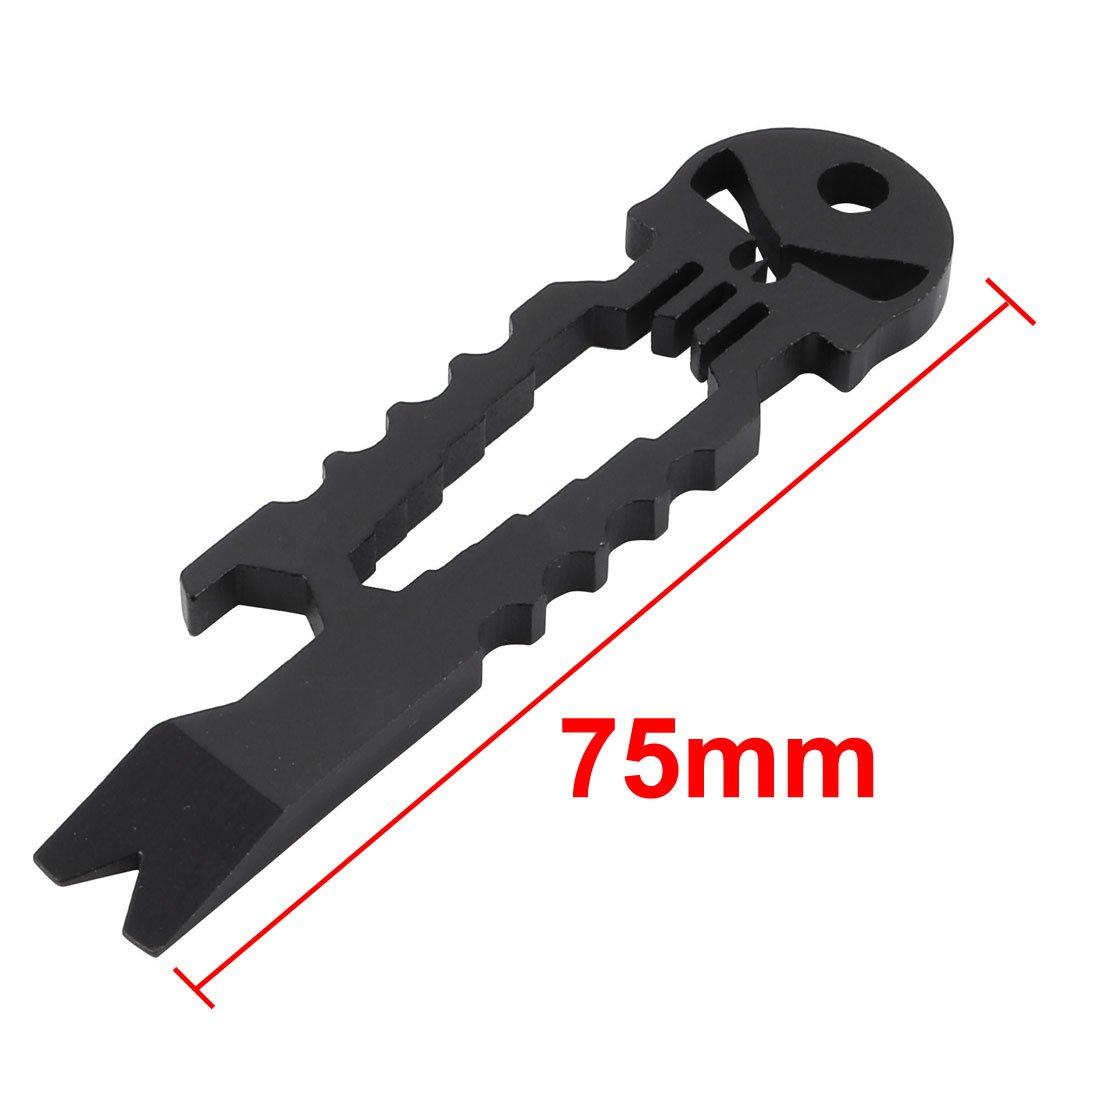 EDC Black Keychain 7-in-1 Multi function Tool Pry Bar Bottle Opener Pocket Tools